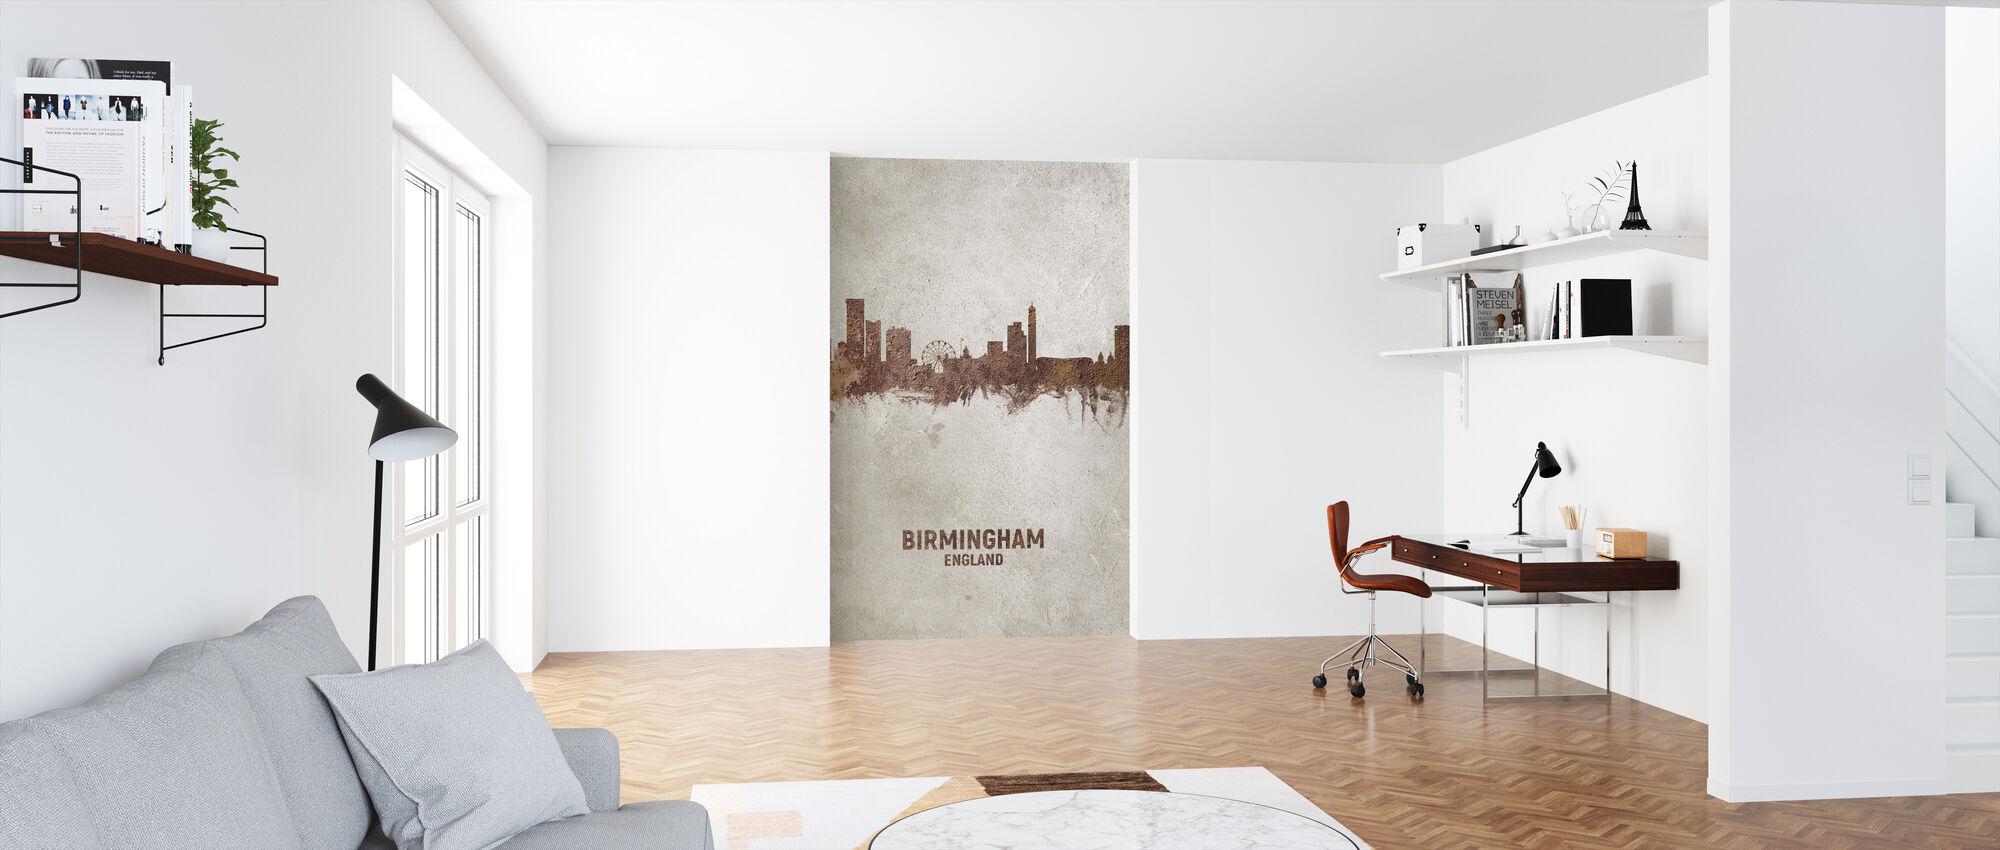 Birmingham England Rust Skyline - Wallpaper - Office